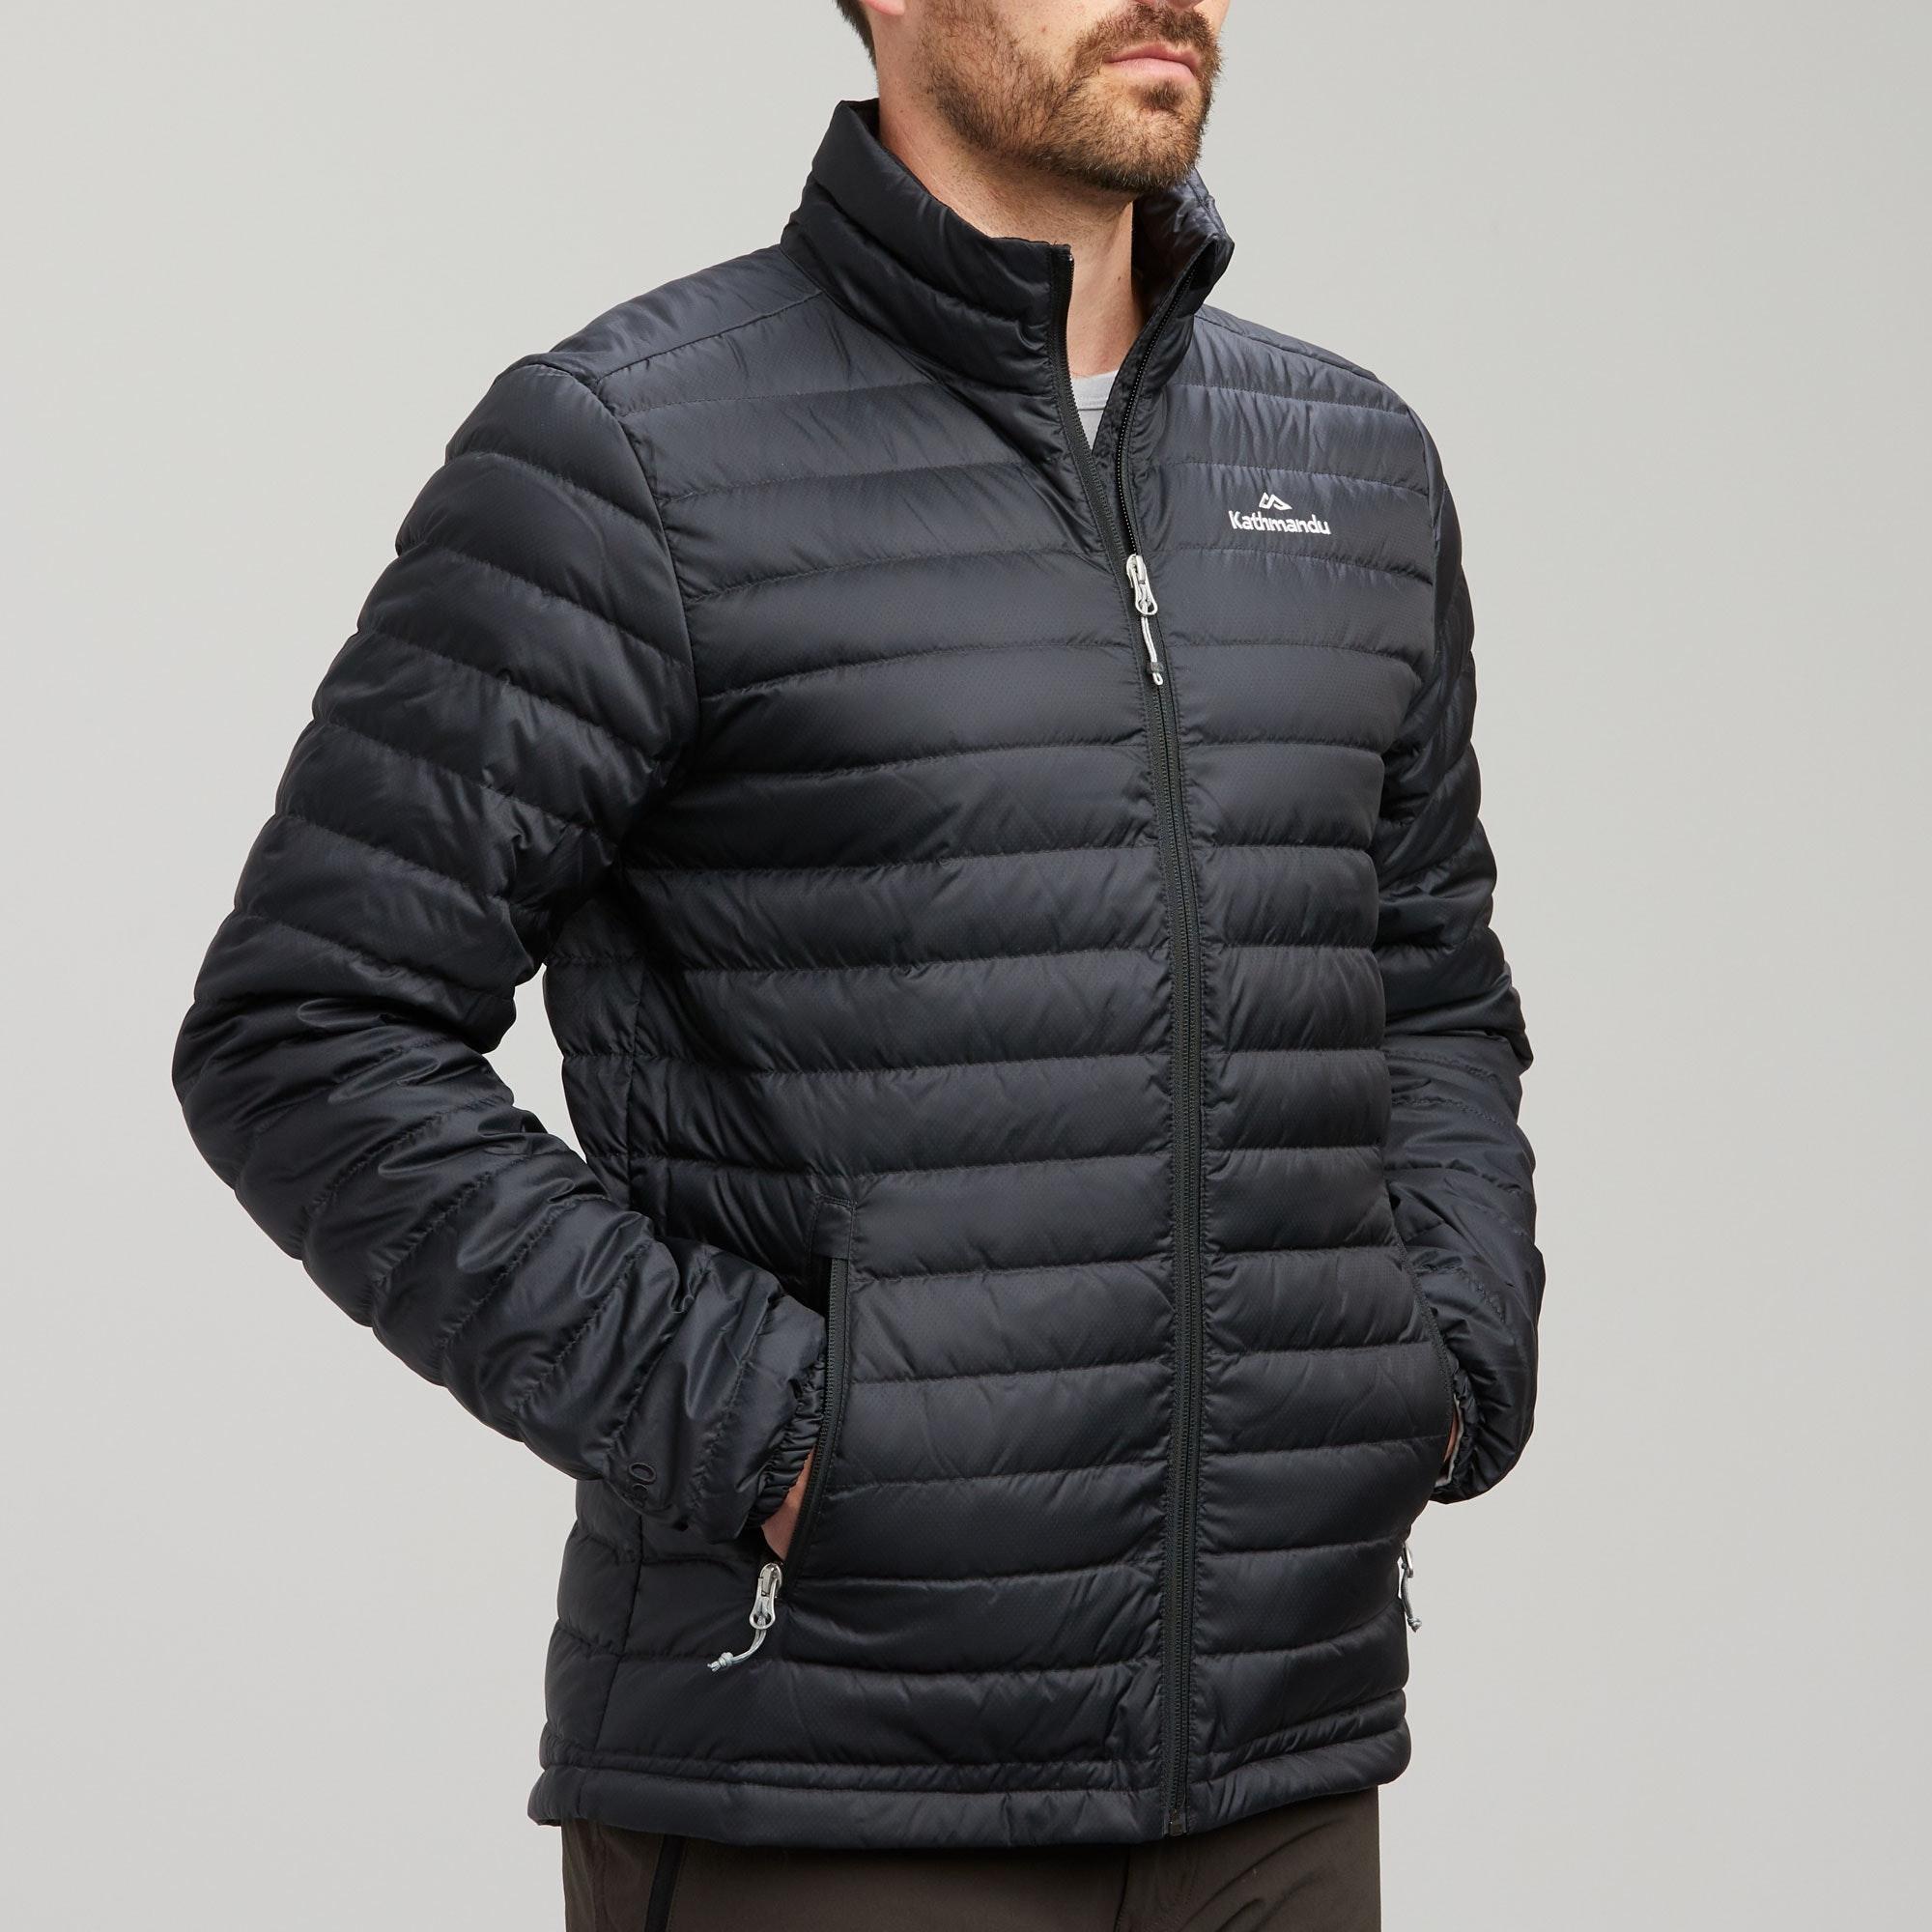 Heli Men's Light Weight Down Jacket v2 - Black